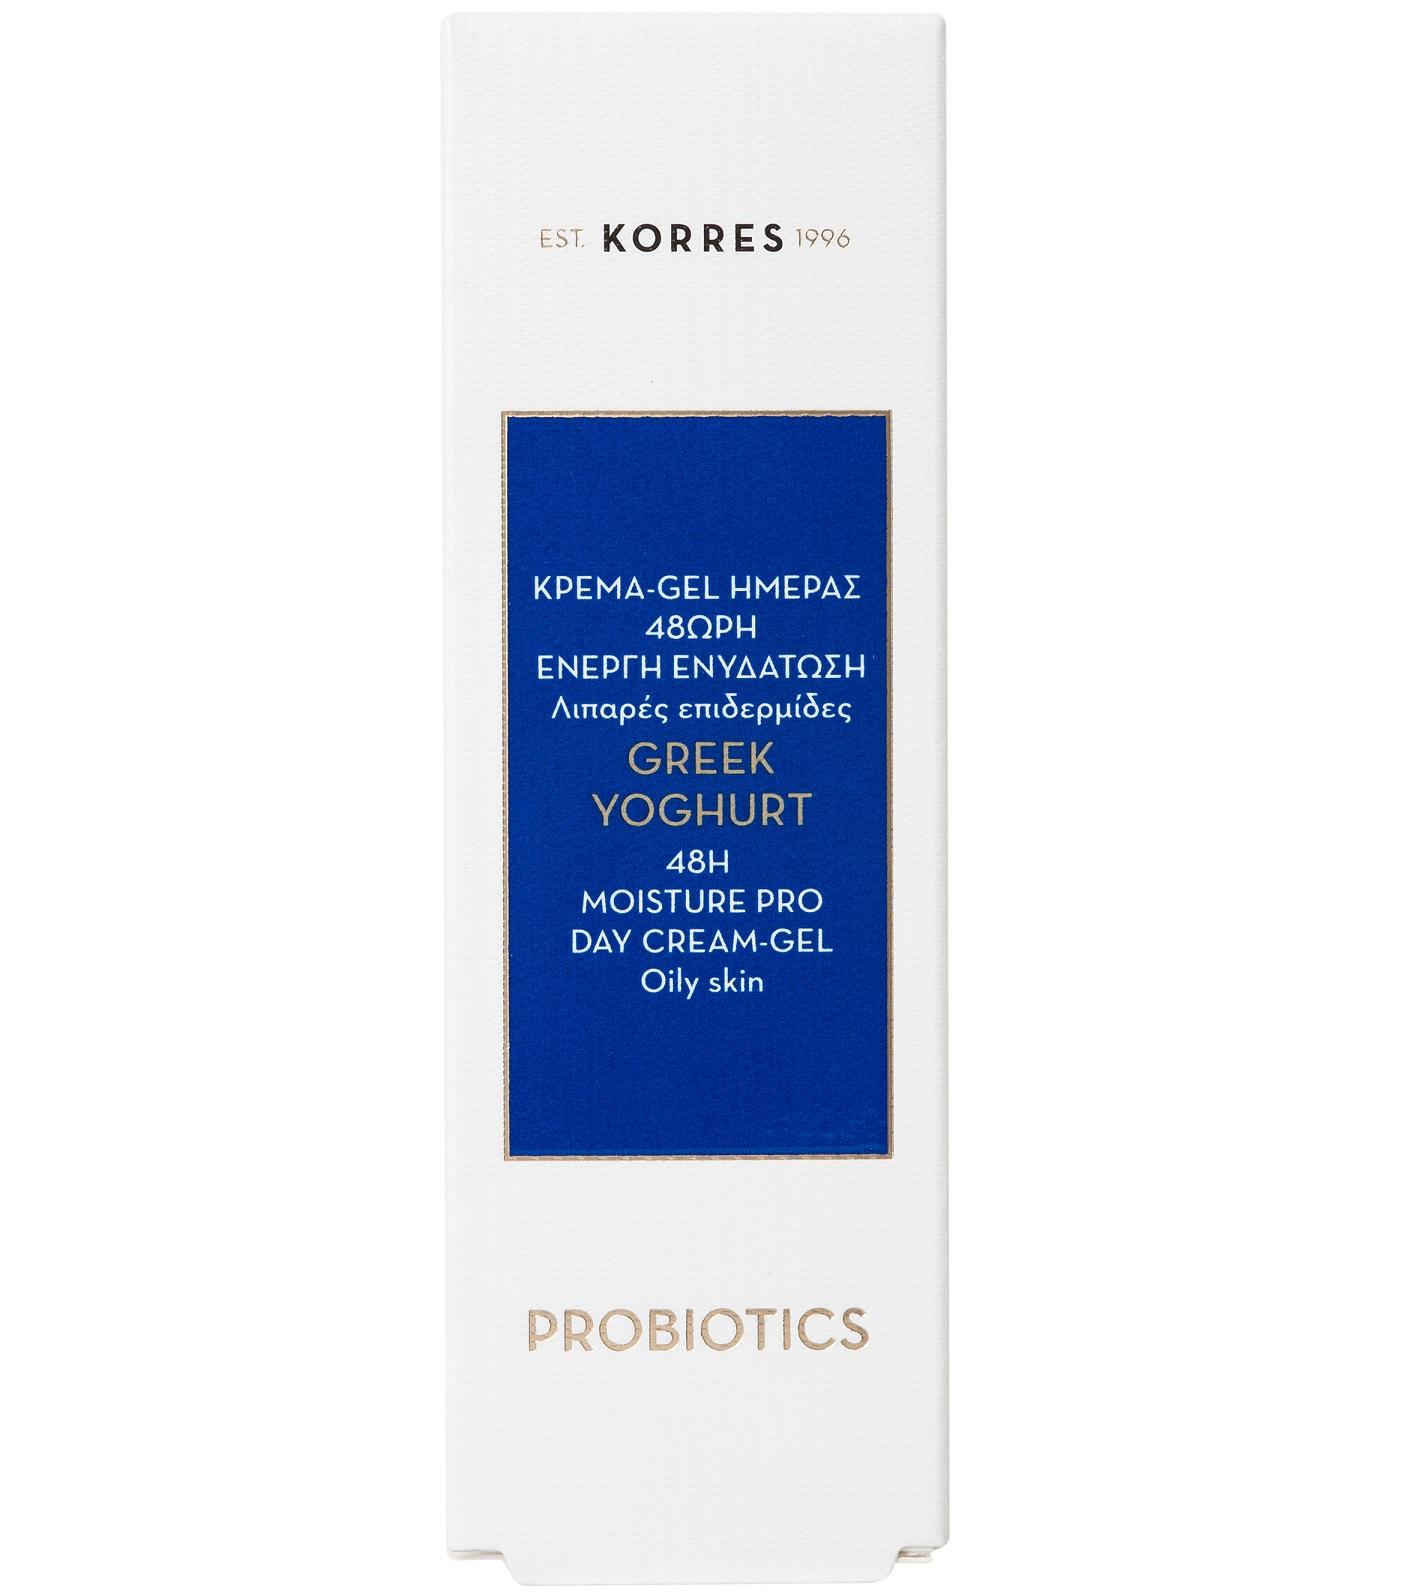 KORRES Greek Yoghurt, Κρέμα Gel Ημέρας 48ωρη Ενυδάτωση, Λιπαρές Επιδερμίδες - 30ml